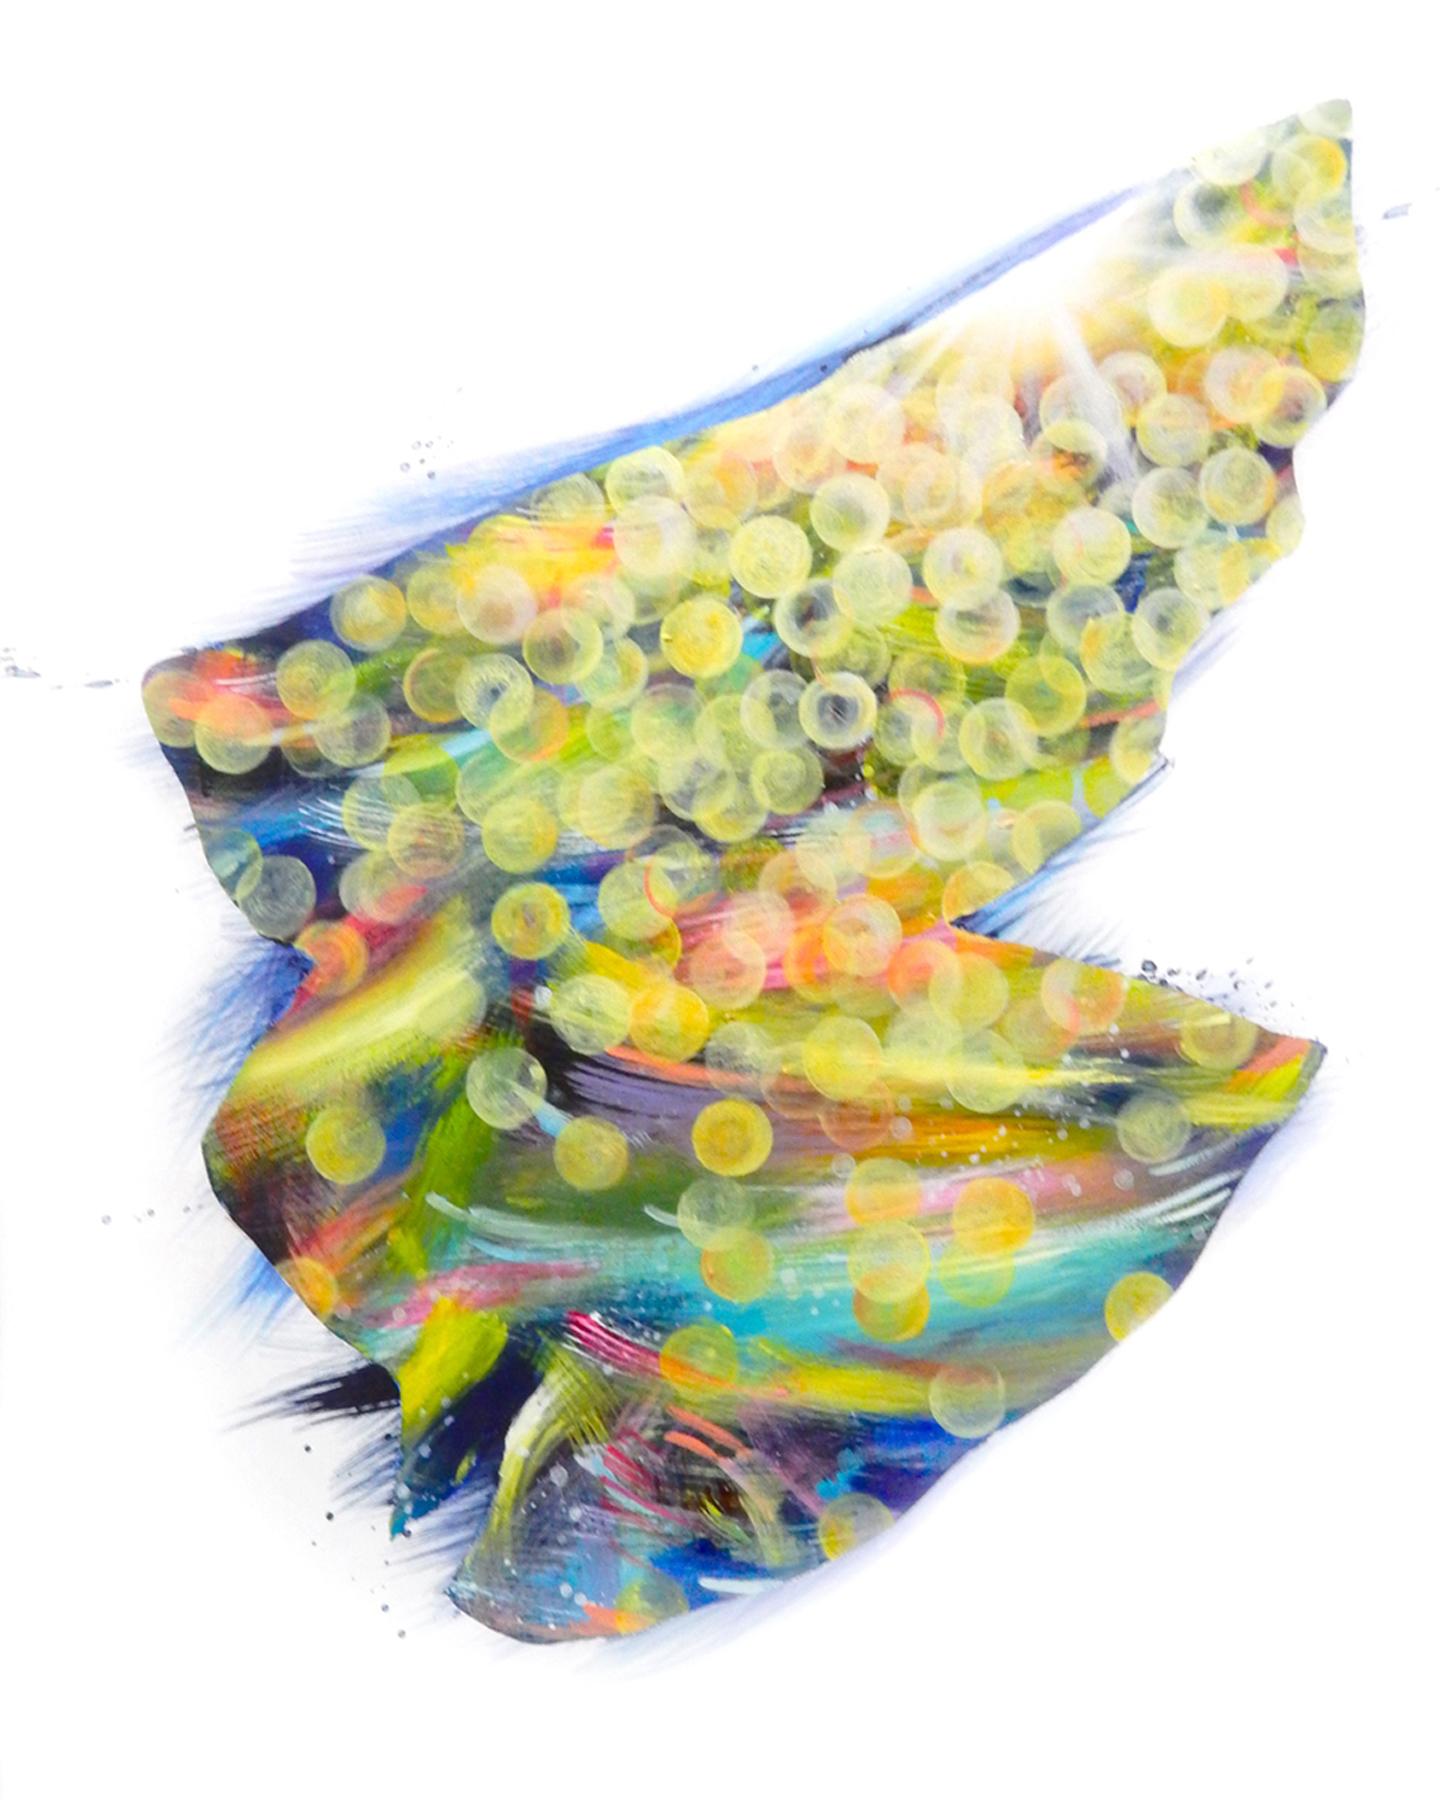 Ayako Bando Towanohikari L Oil & Acrylic on canvas